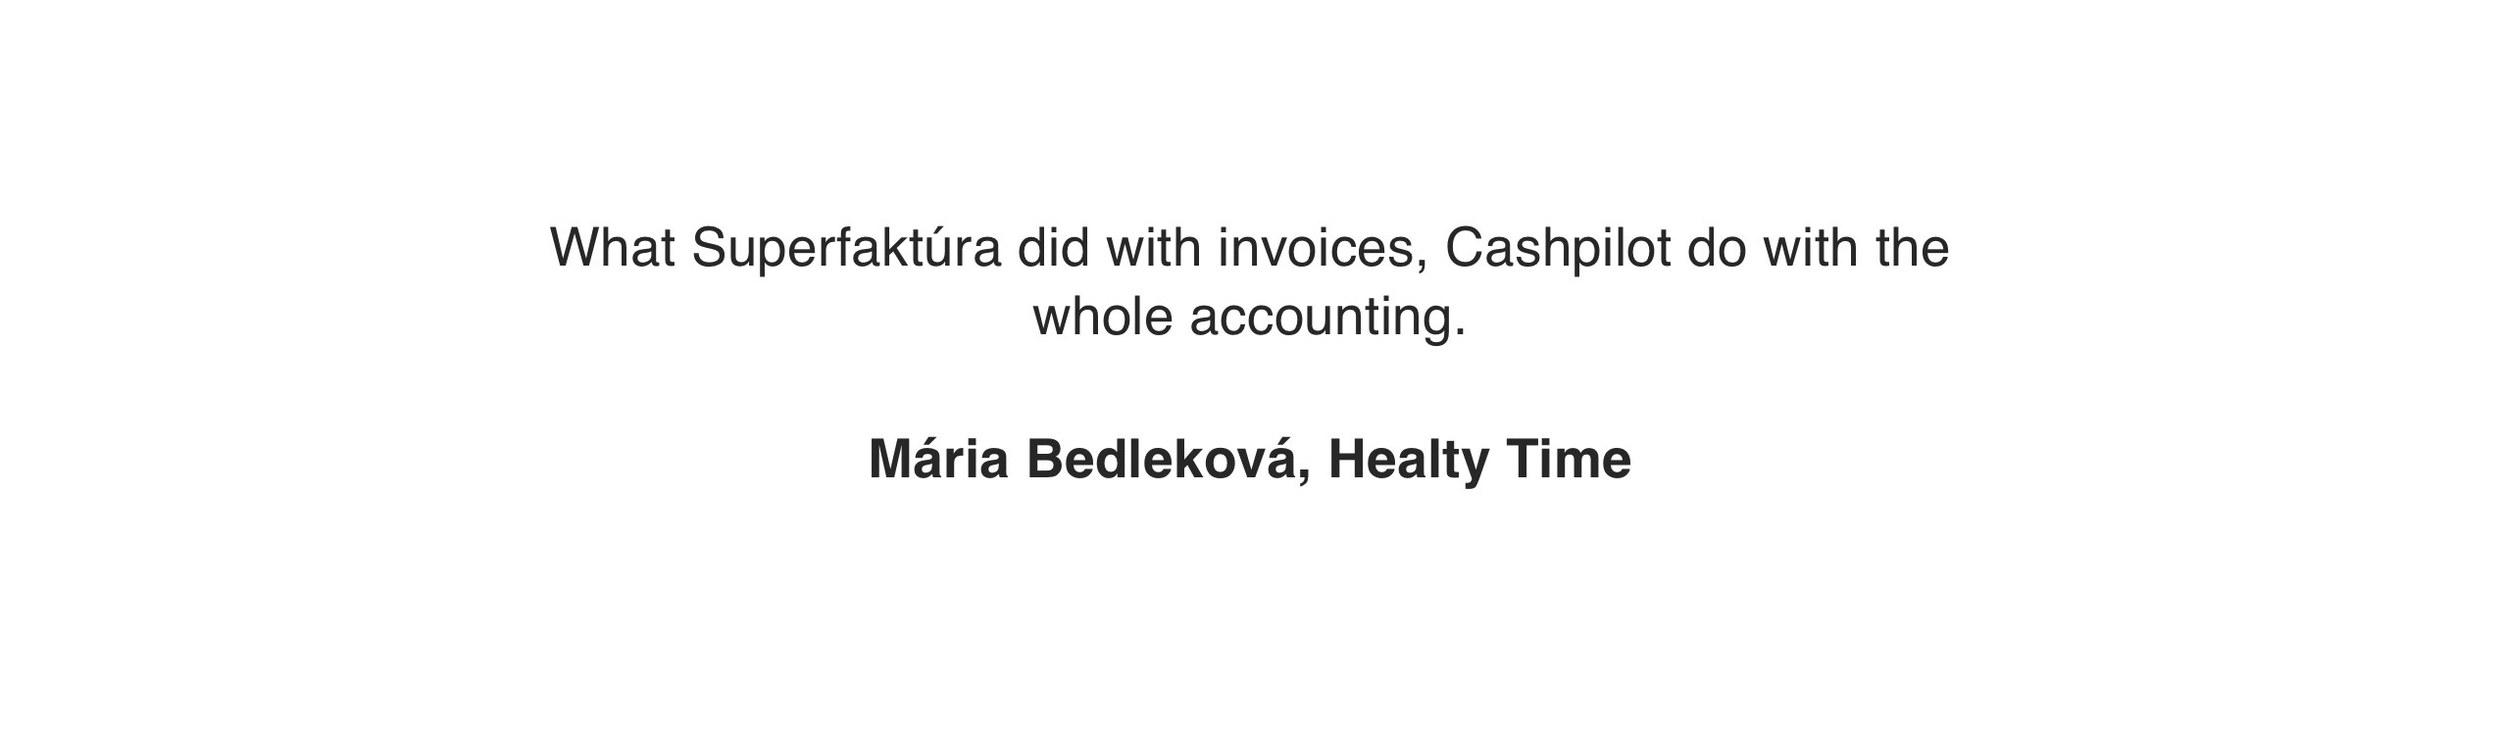 cashpilot testimonial en 04.jpg